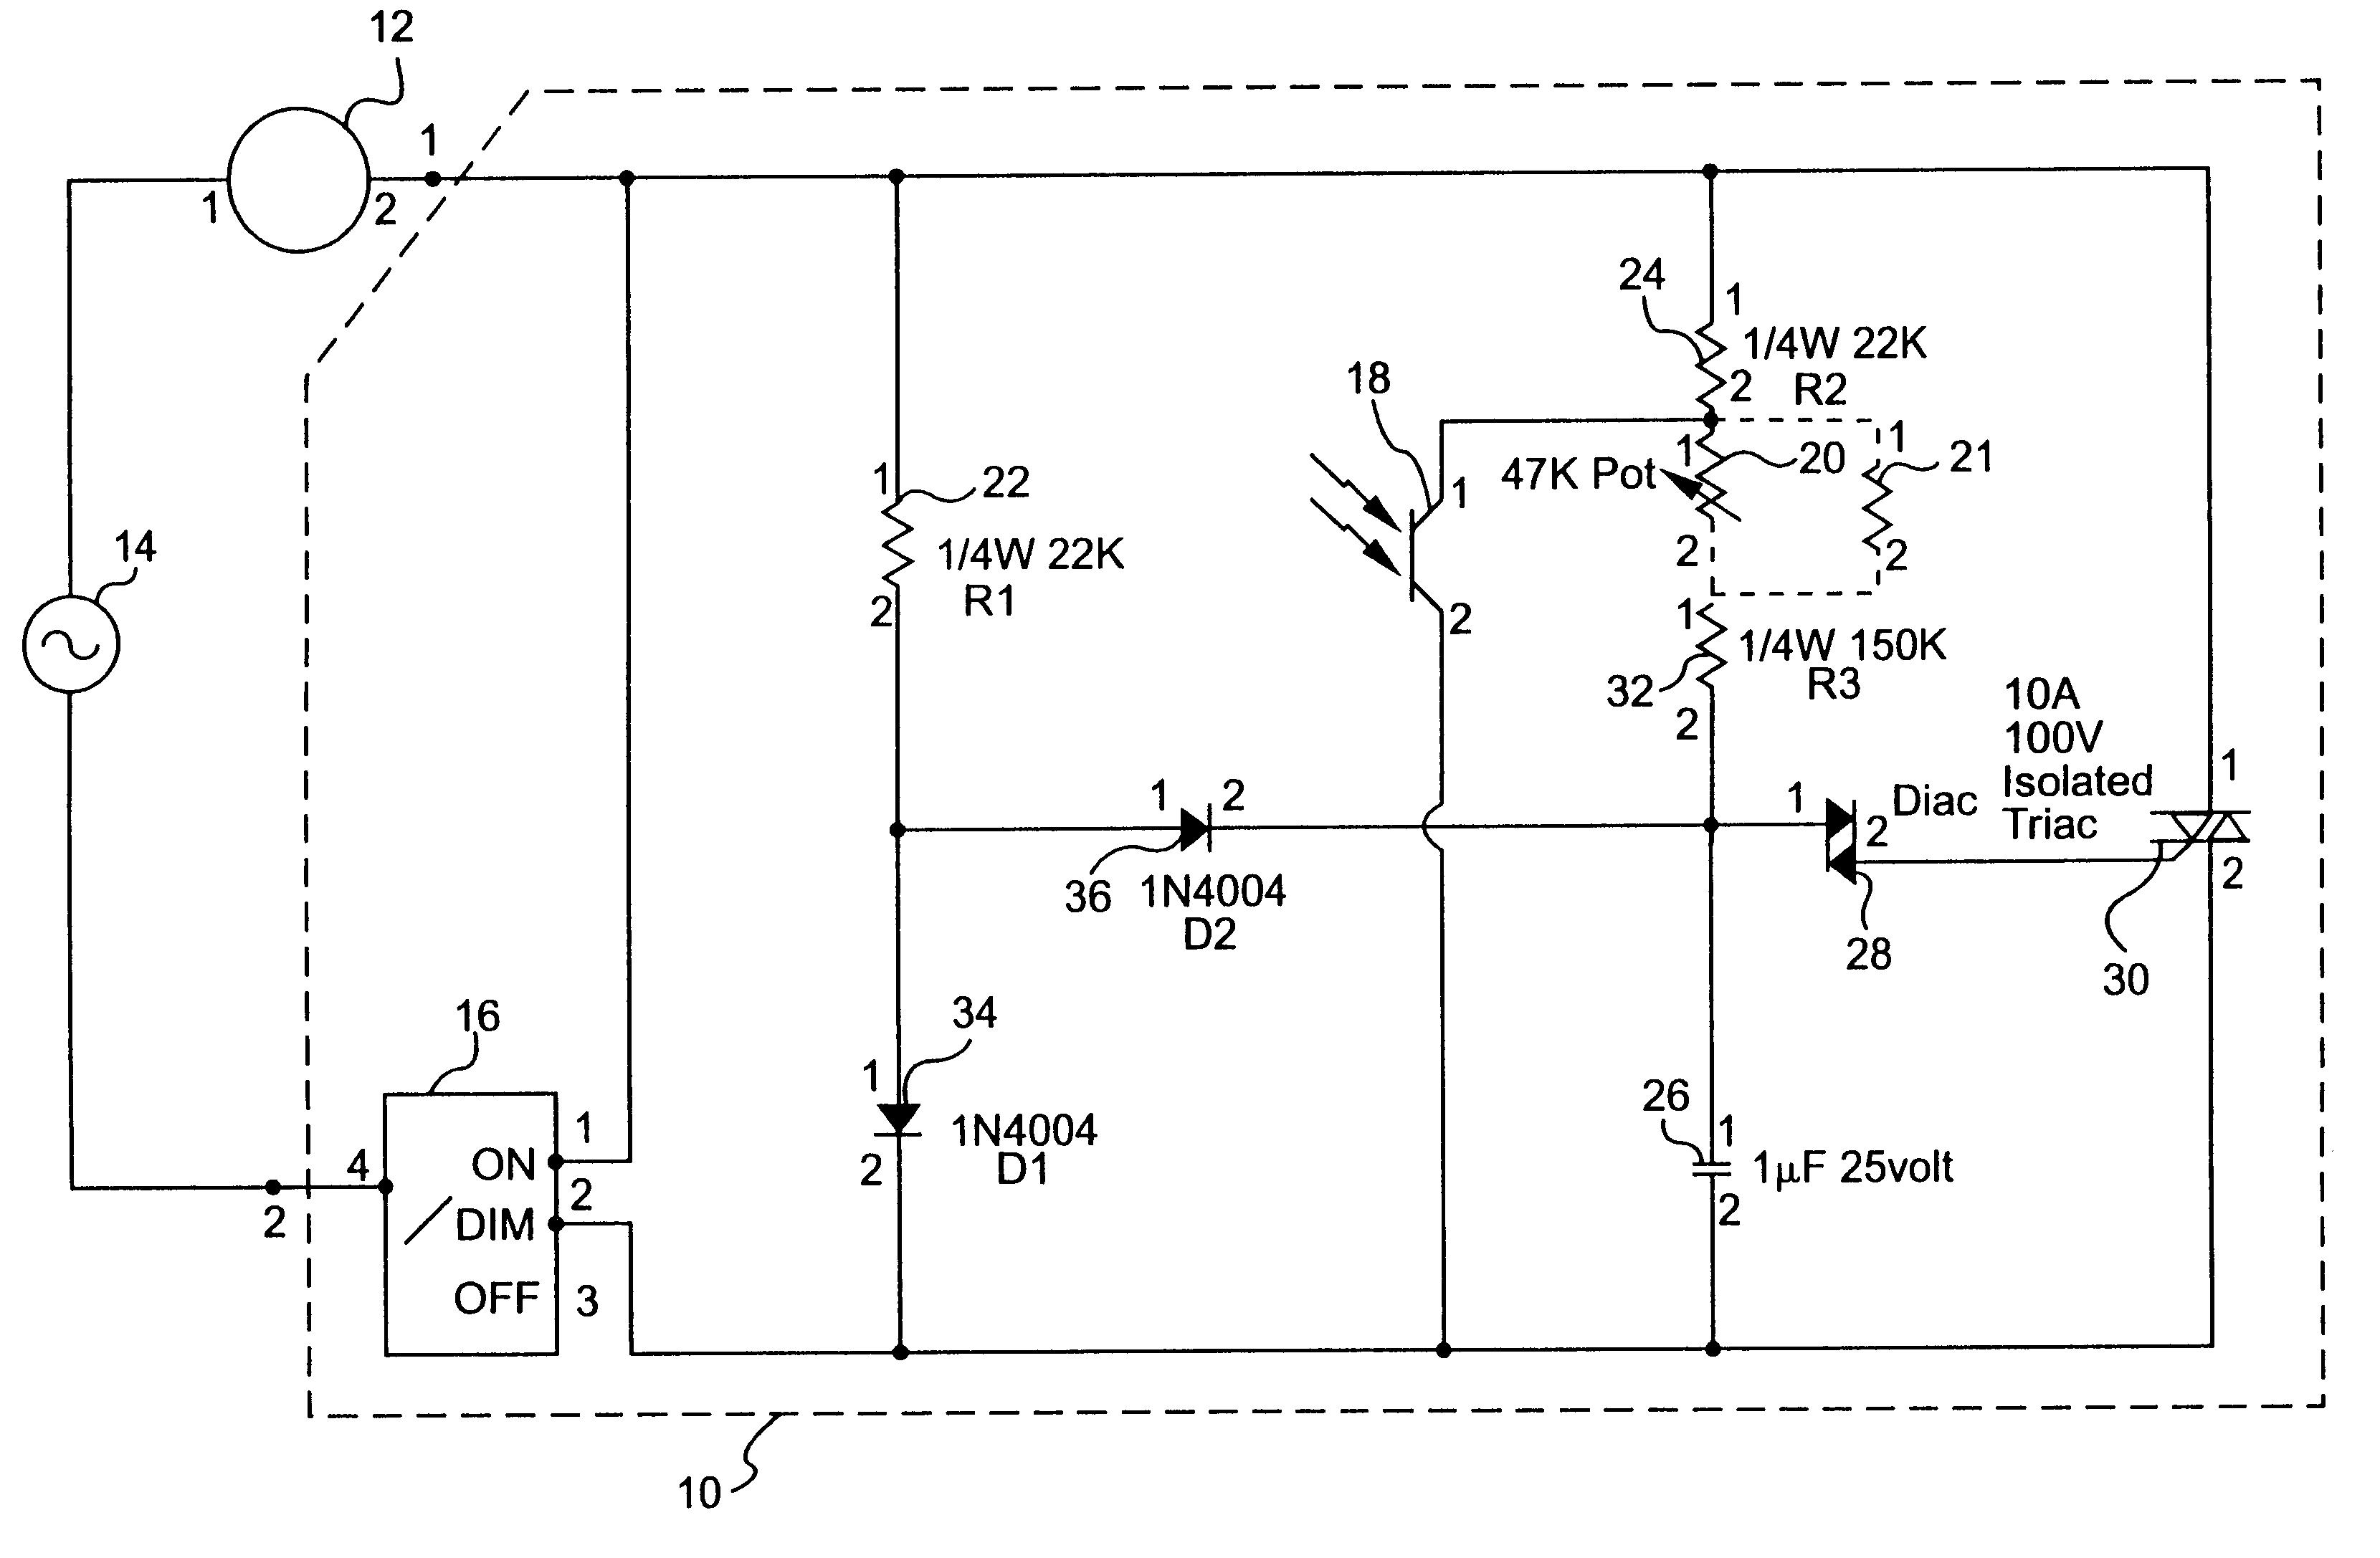 Bremas Drum Switch Wiring Diagram Reversing